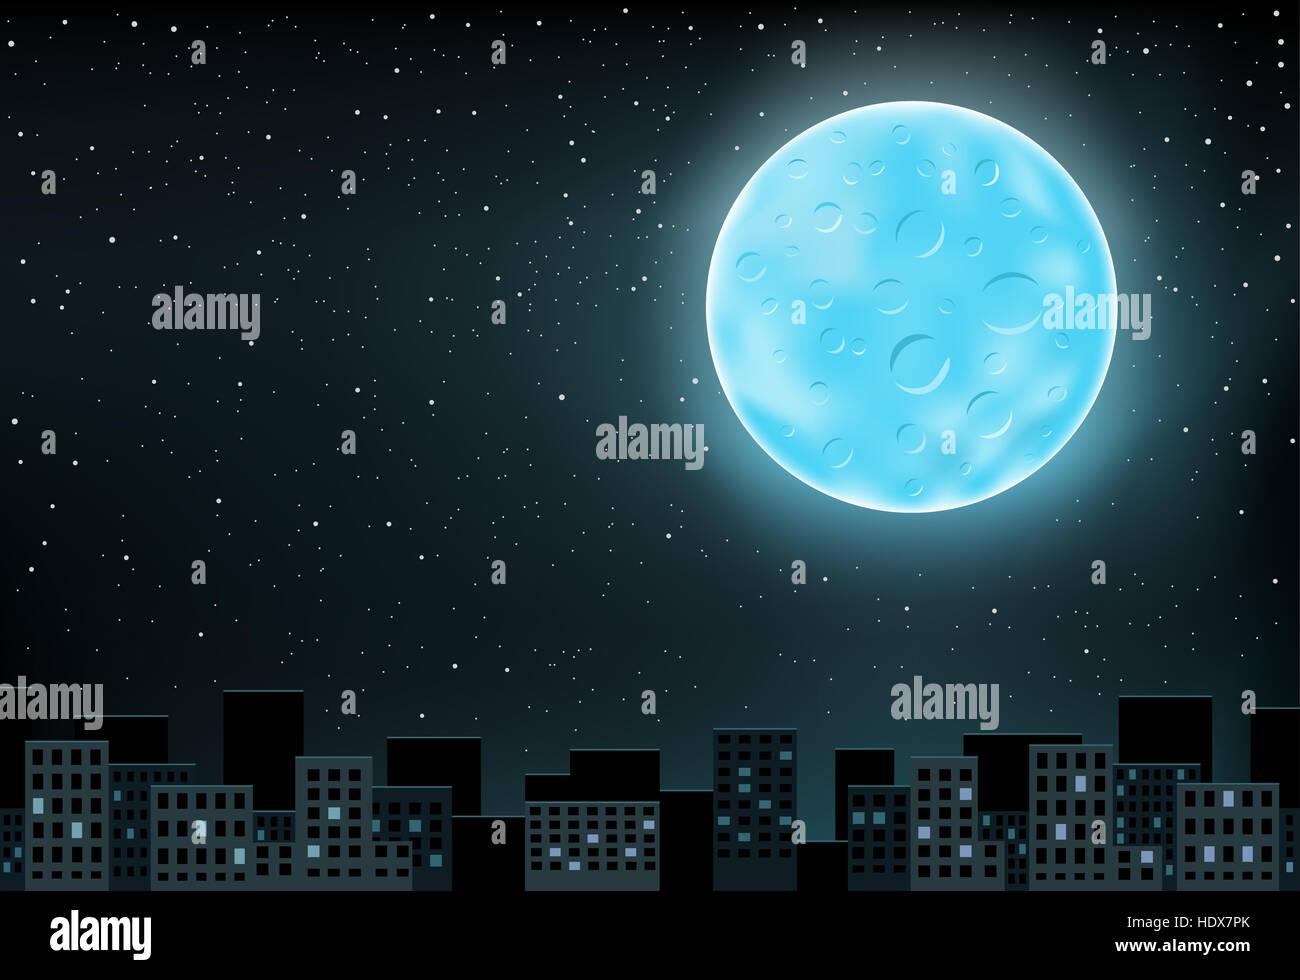 The large blue shining moon over night city on stars background - Stock Image